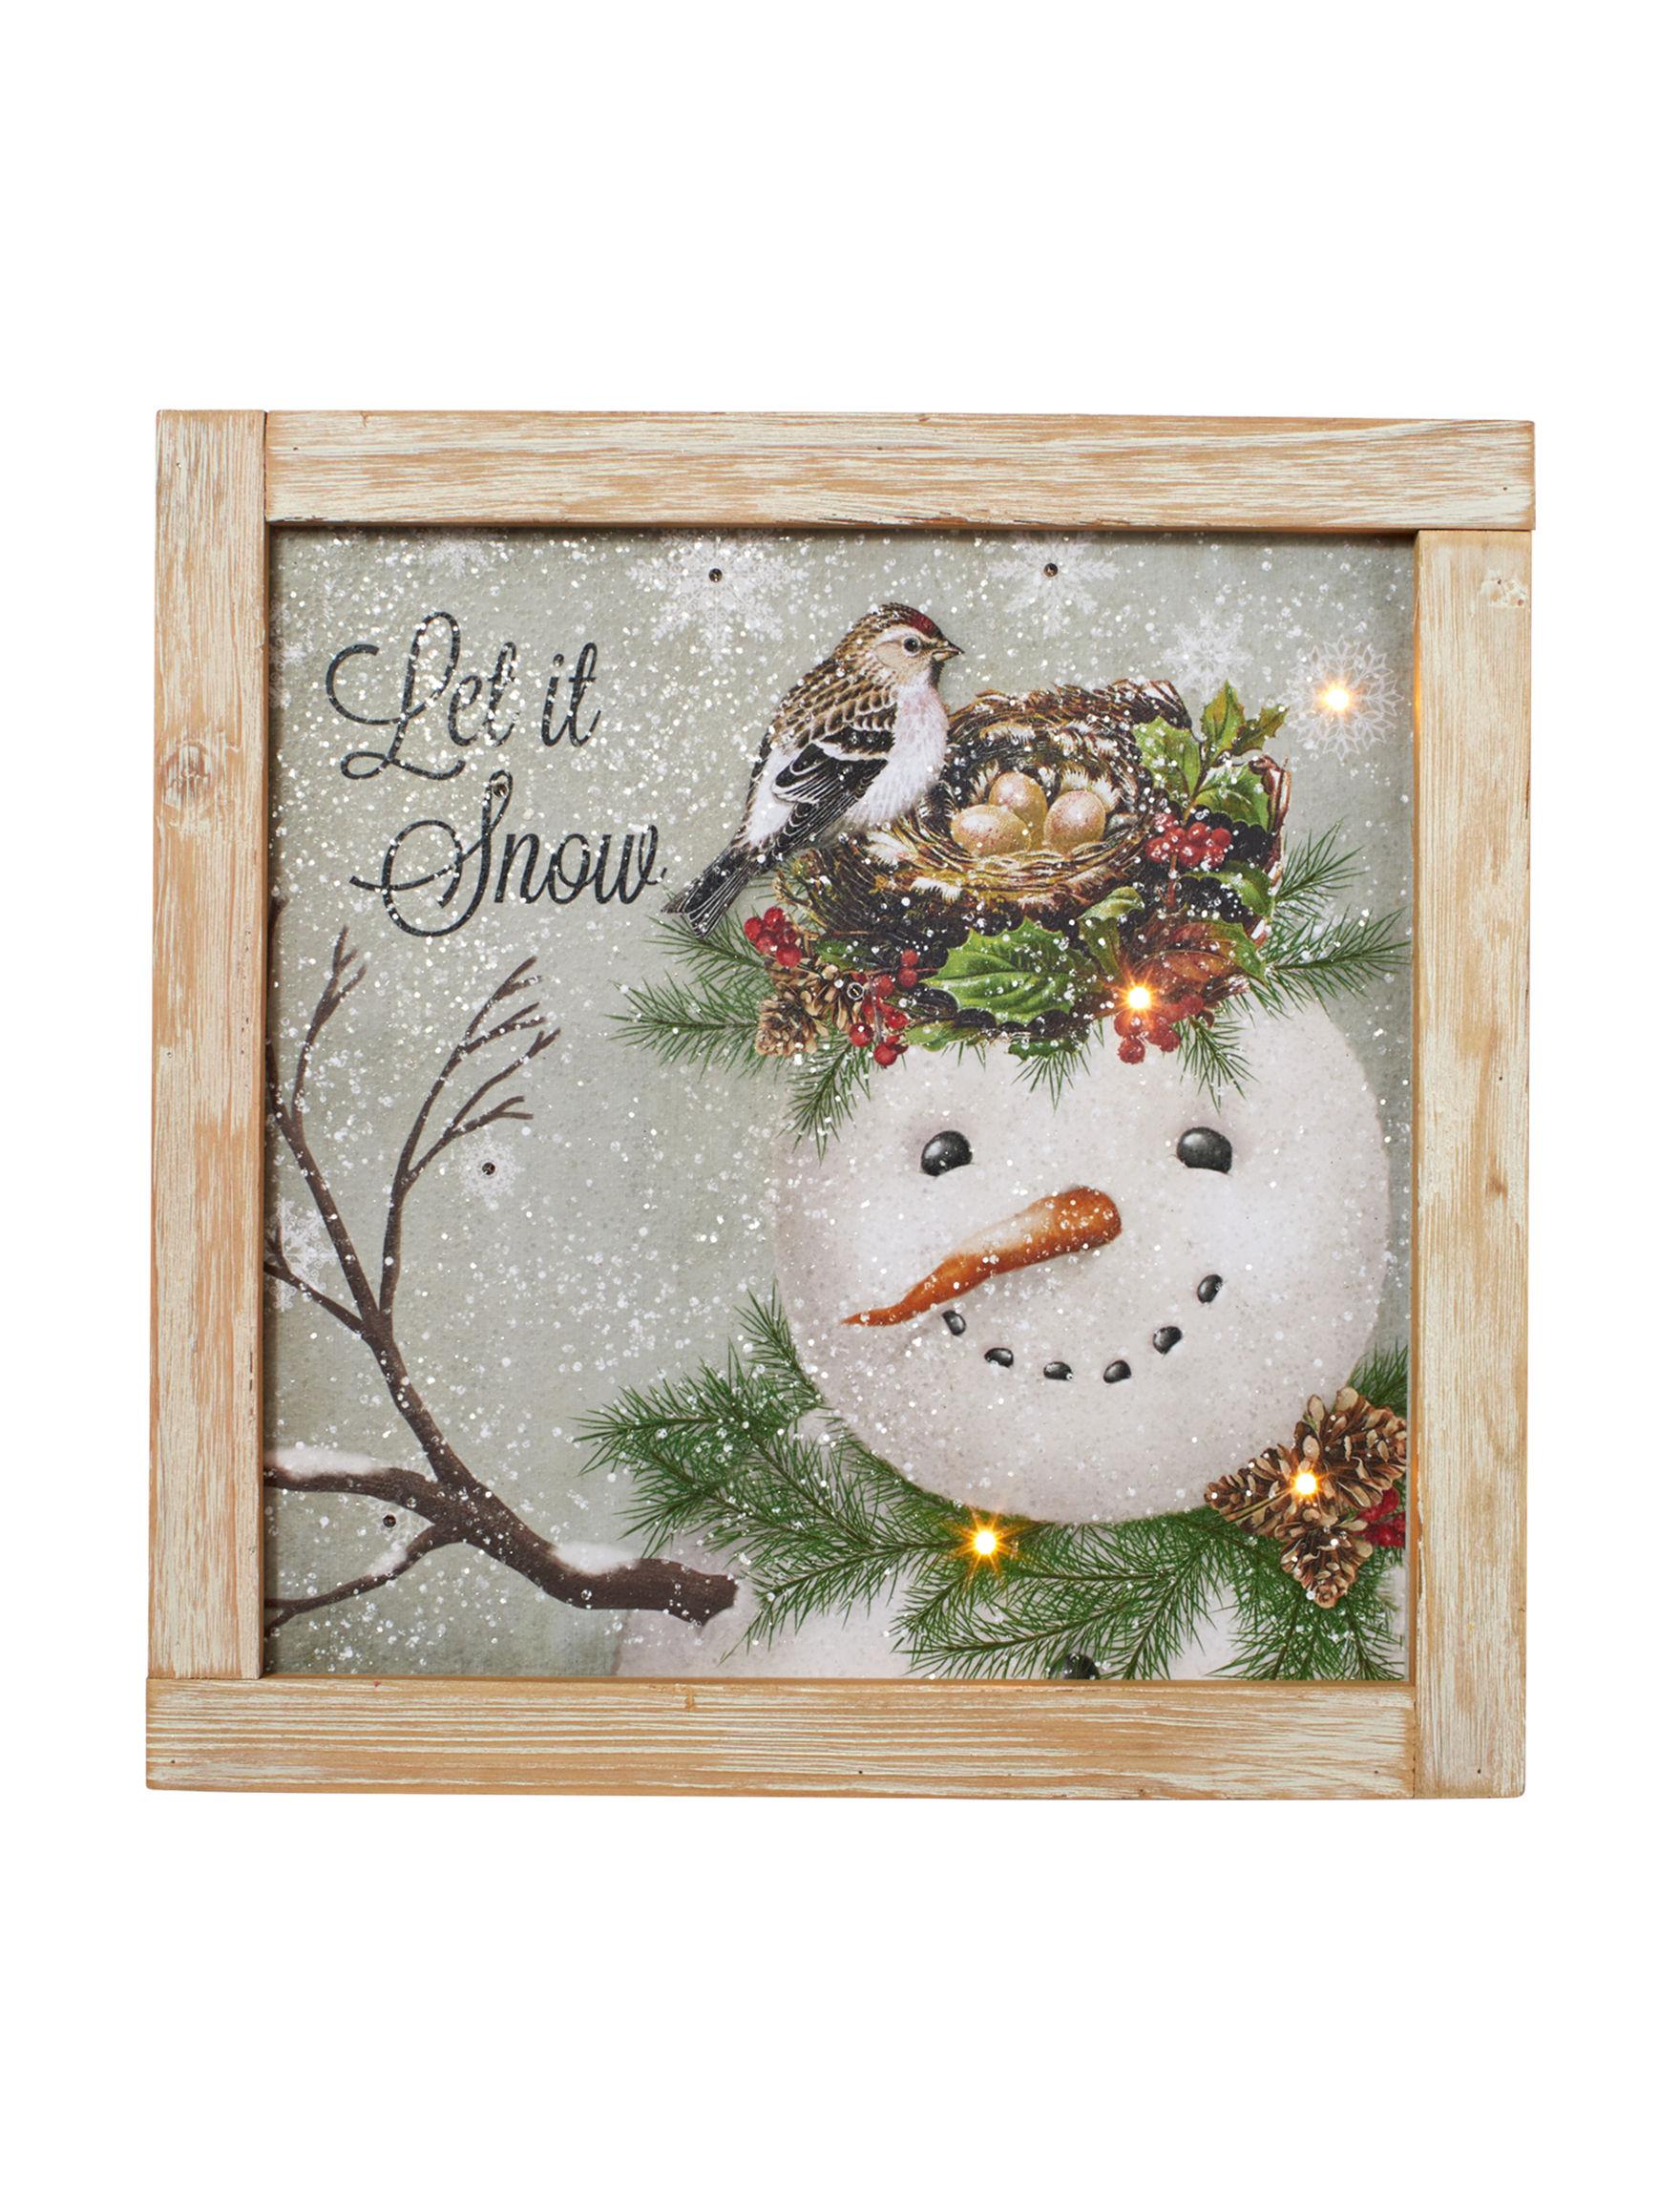 Jingle Bell Lane Green Multi Decorative Objects Holiday Decor